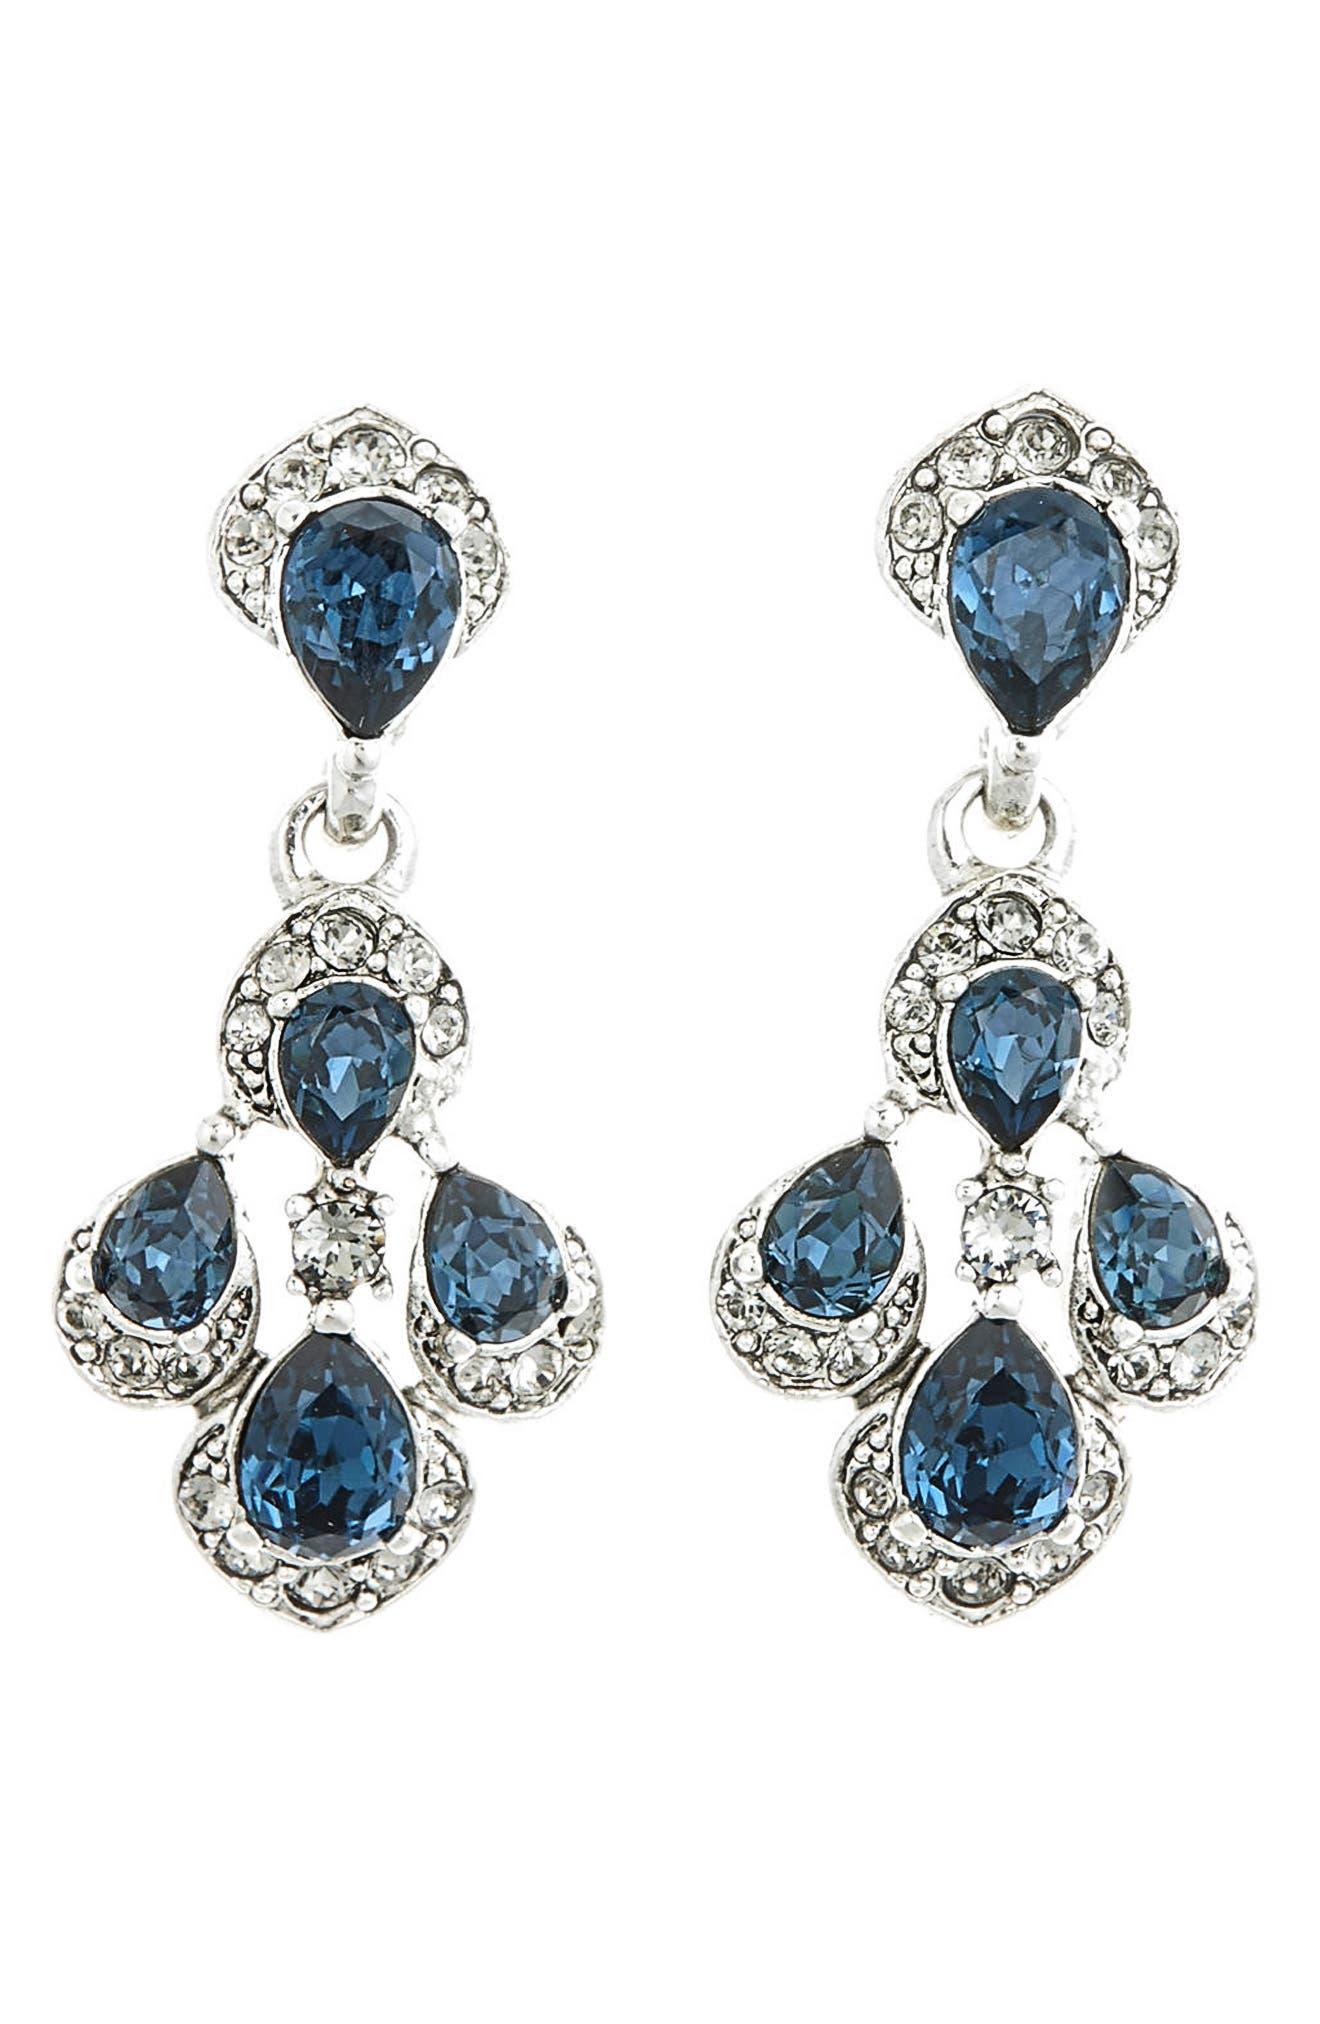 Parlor Crystal Earrings,                             Main thumbnail 1, color,                             400